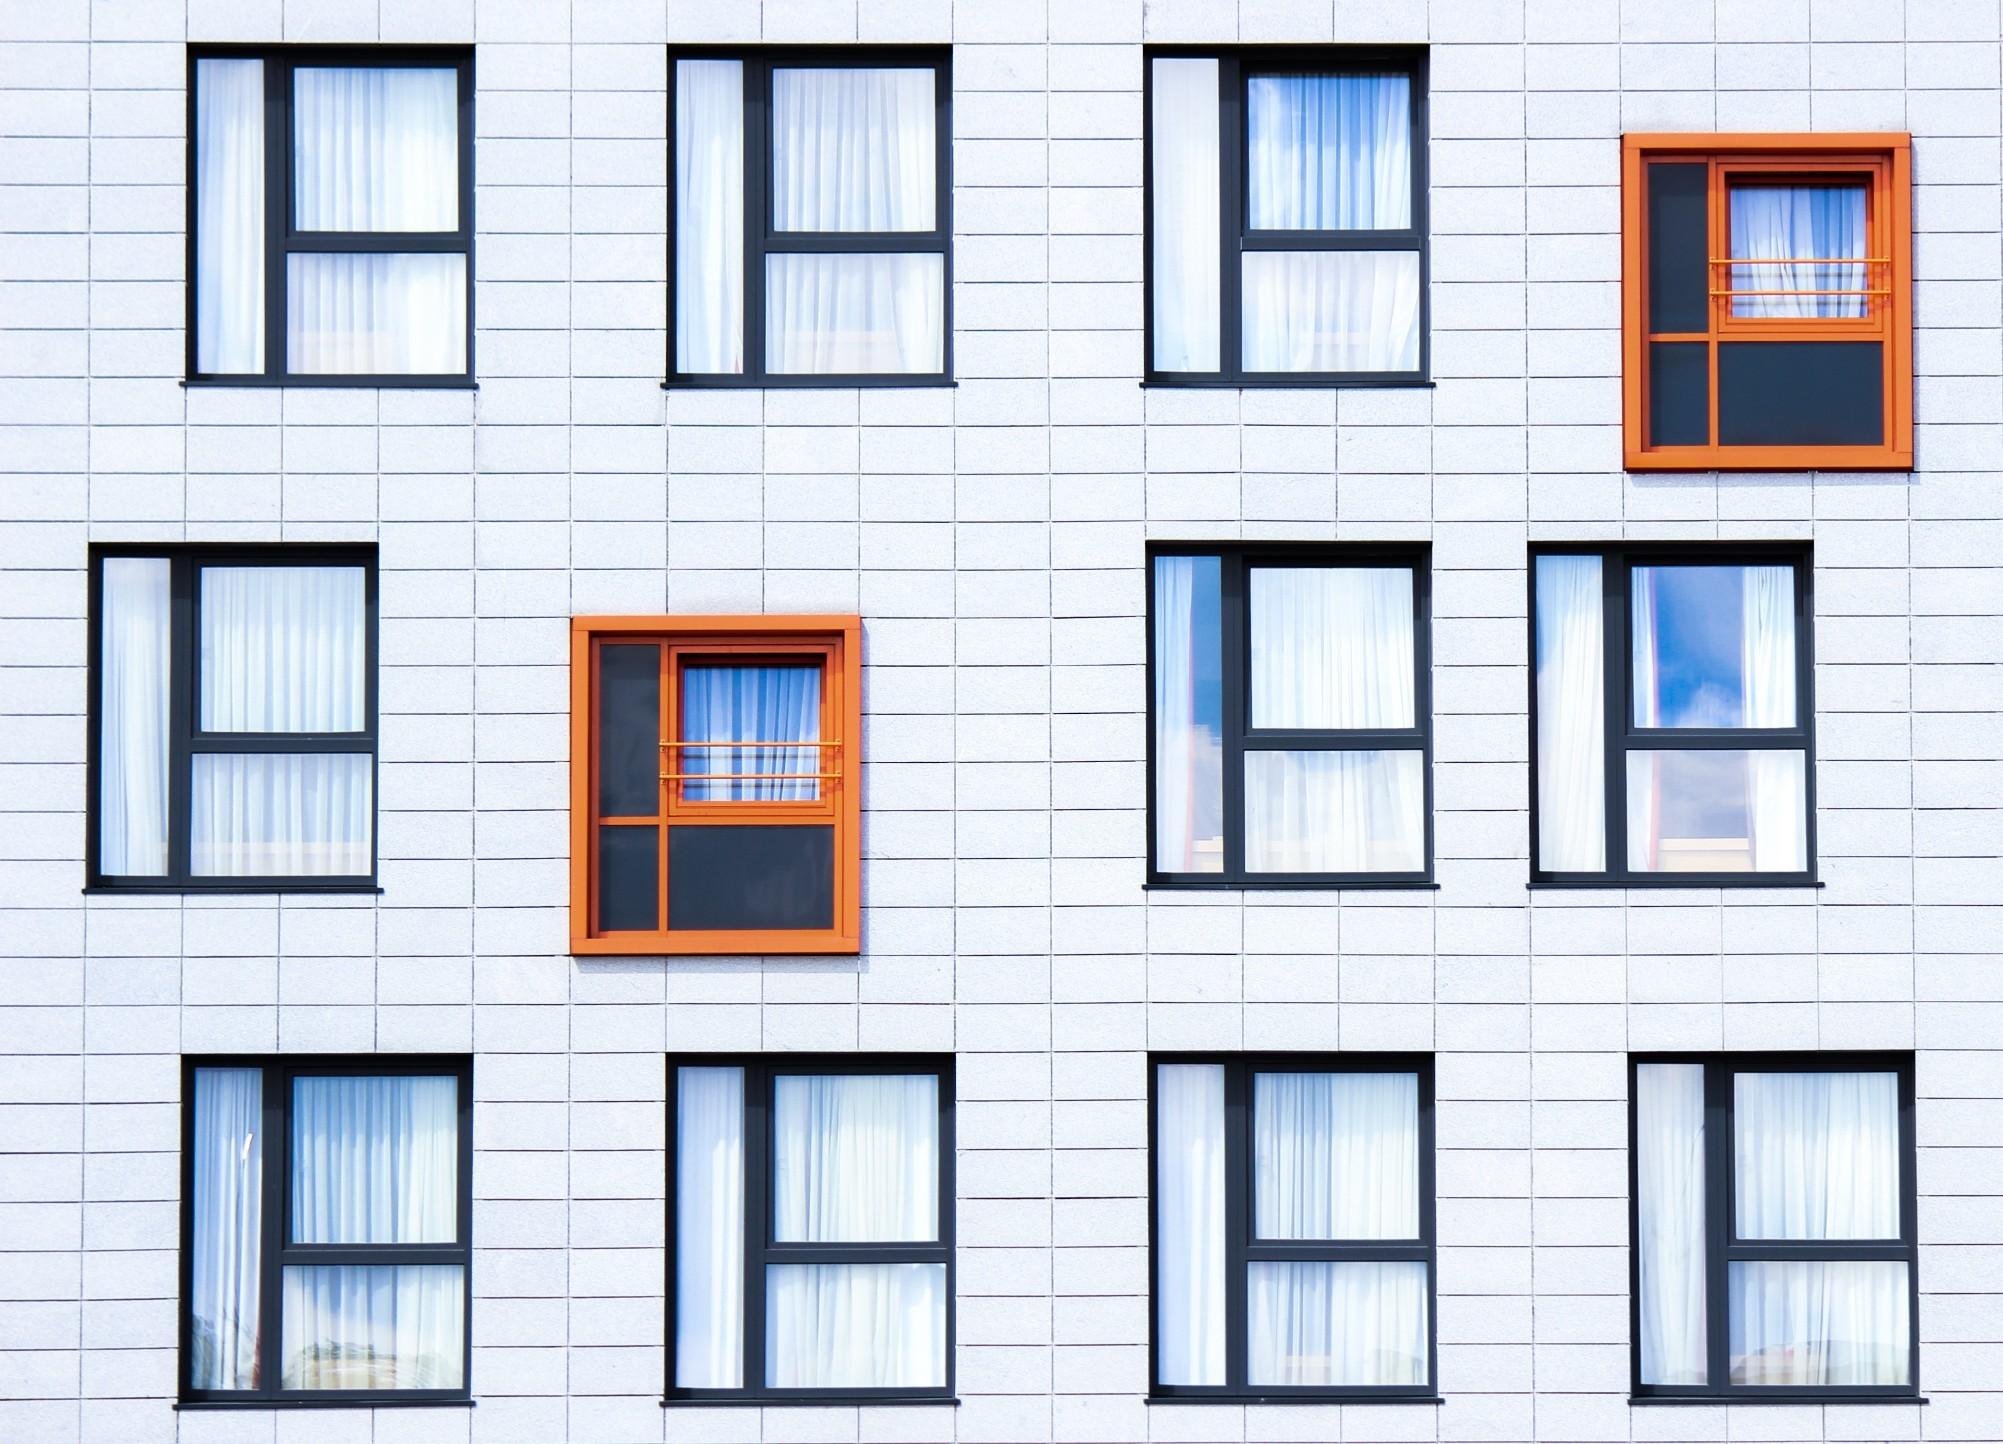 ferestre-otto-richter